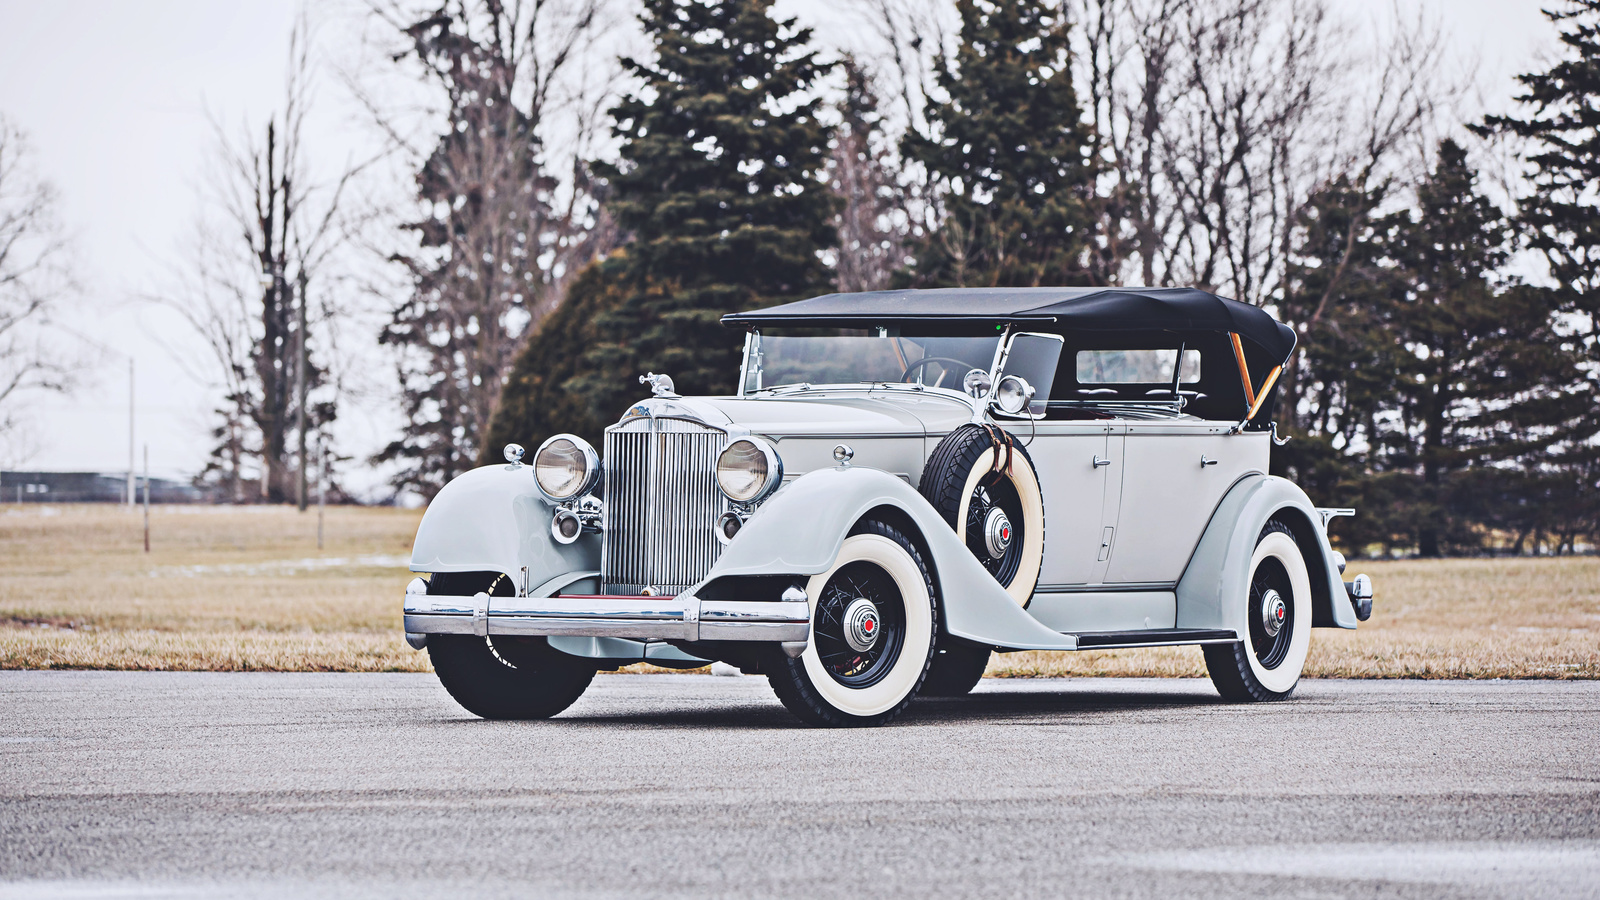 phaeton, retro cars, 1934, cars, luxury cars, packard